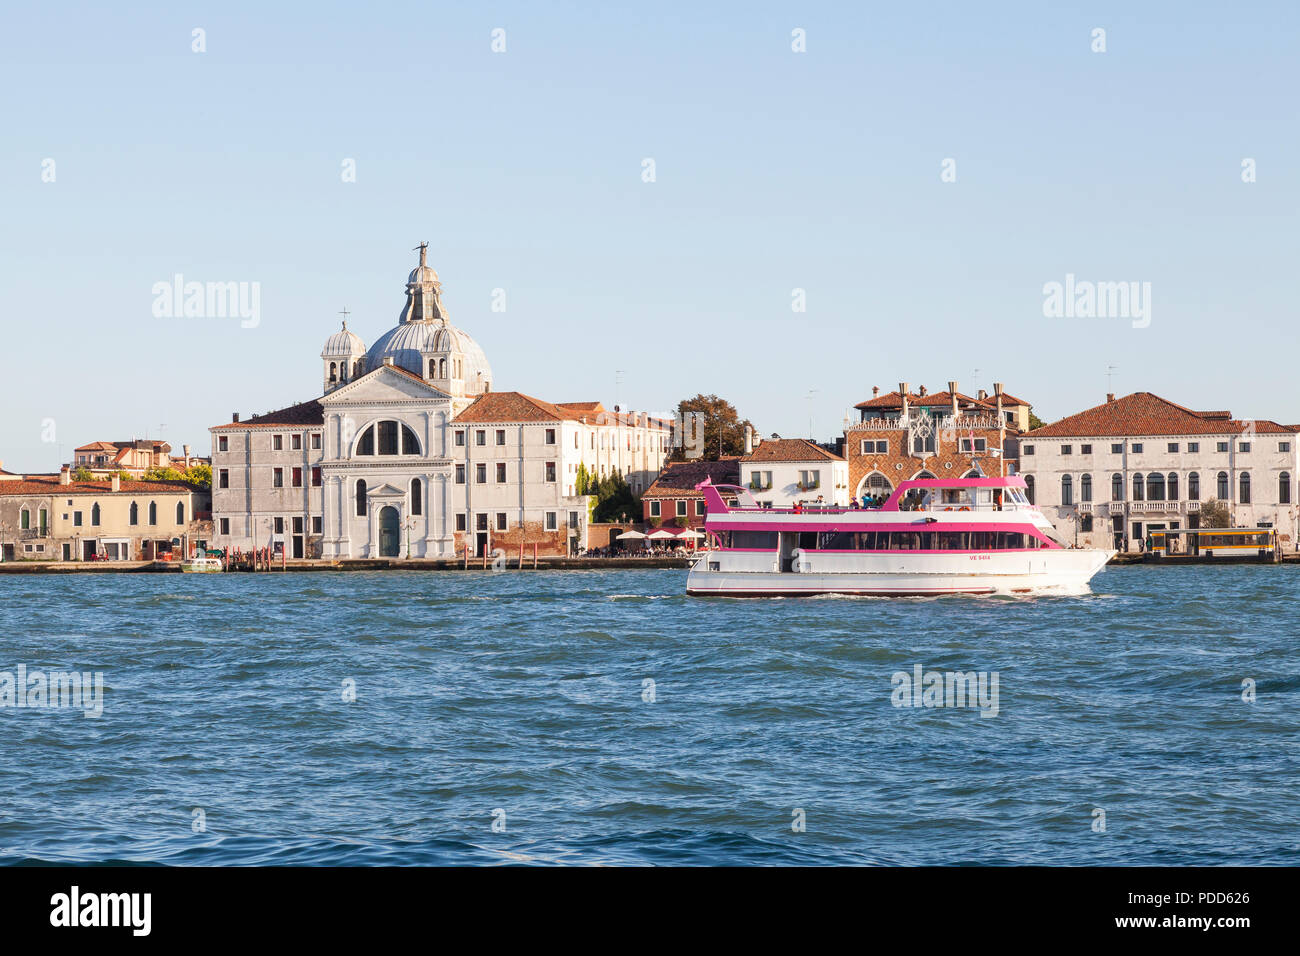 The Pink Venice tour boat, Giudecca Canal, Venice, Veneto, Italy at sunset  passing the Zitelle Church and Tre Oci Exhibition Centre on Giudecca Islan - Stock Image